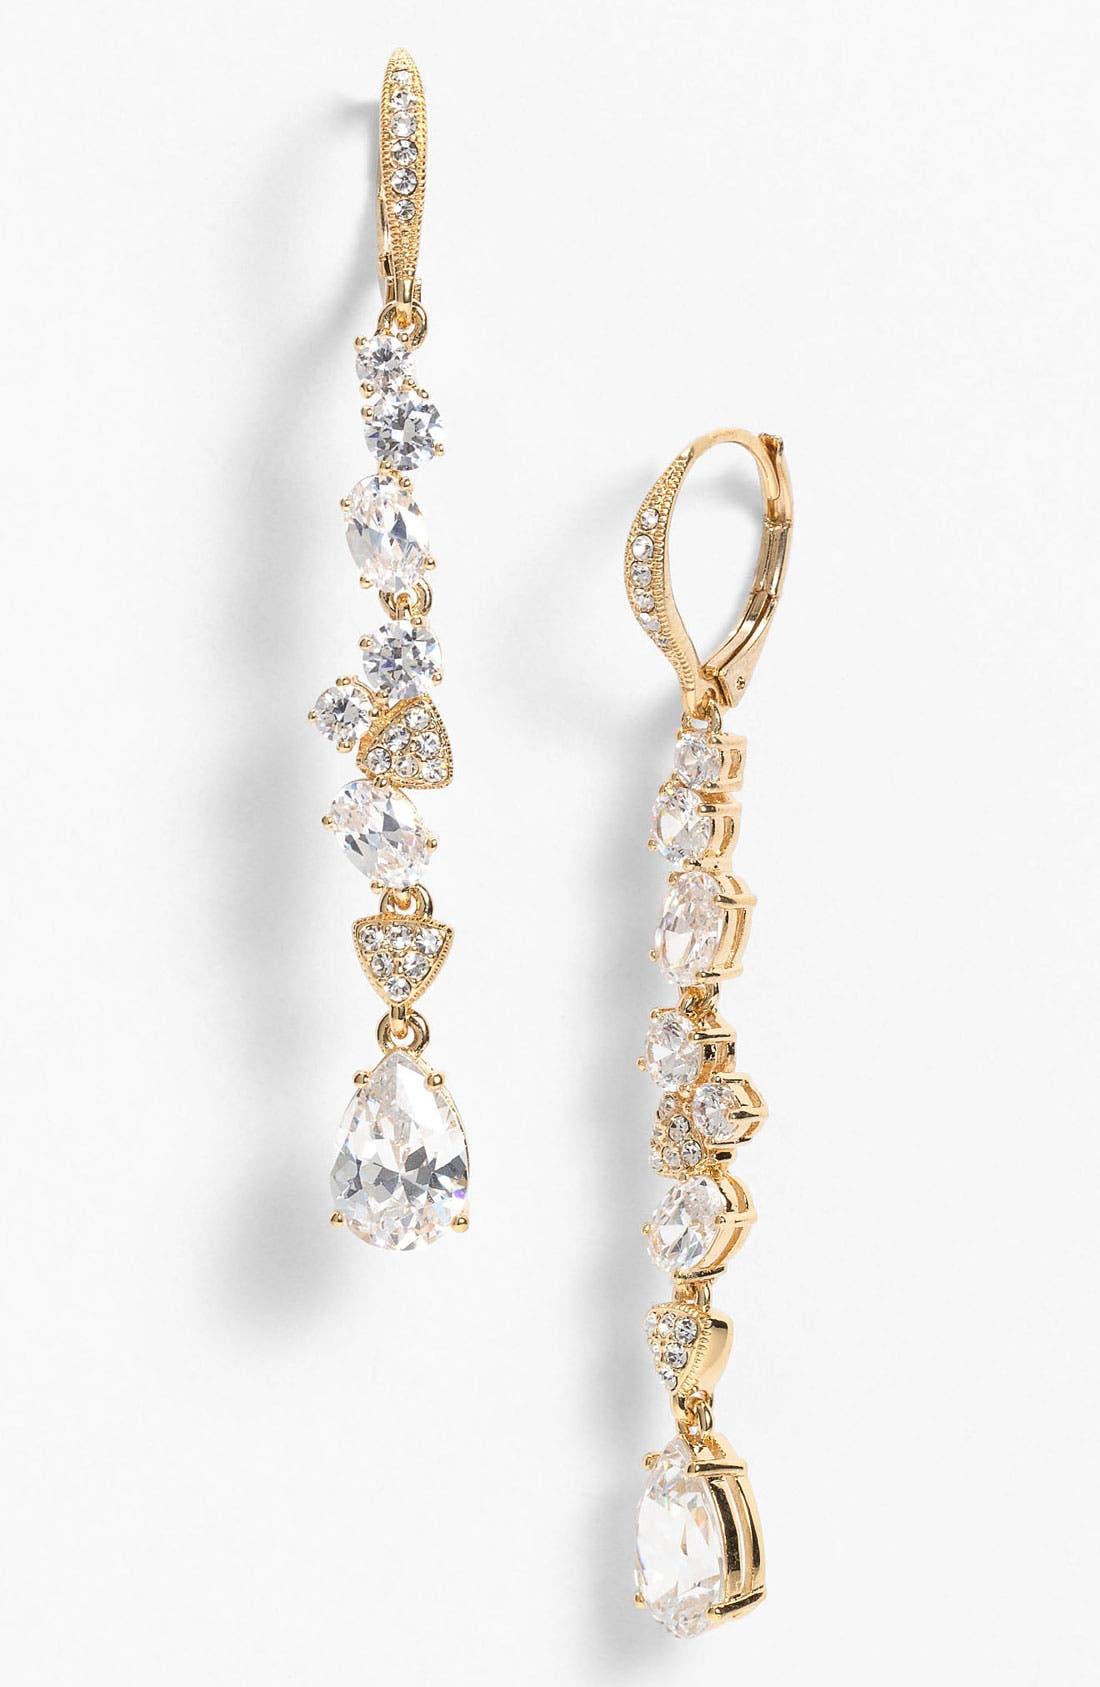 Main Image - Nadri Cubic Zirconia Cluster Linear Earrings (Nordstrom Exclusive)